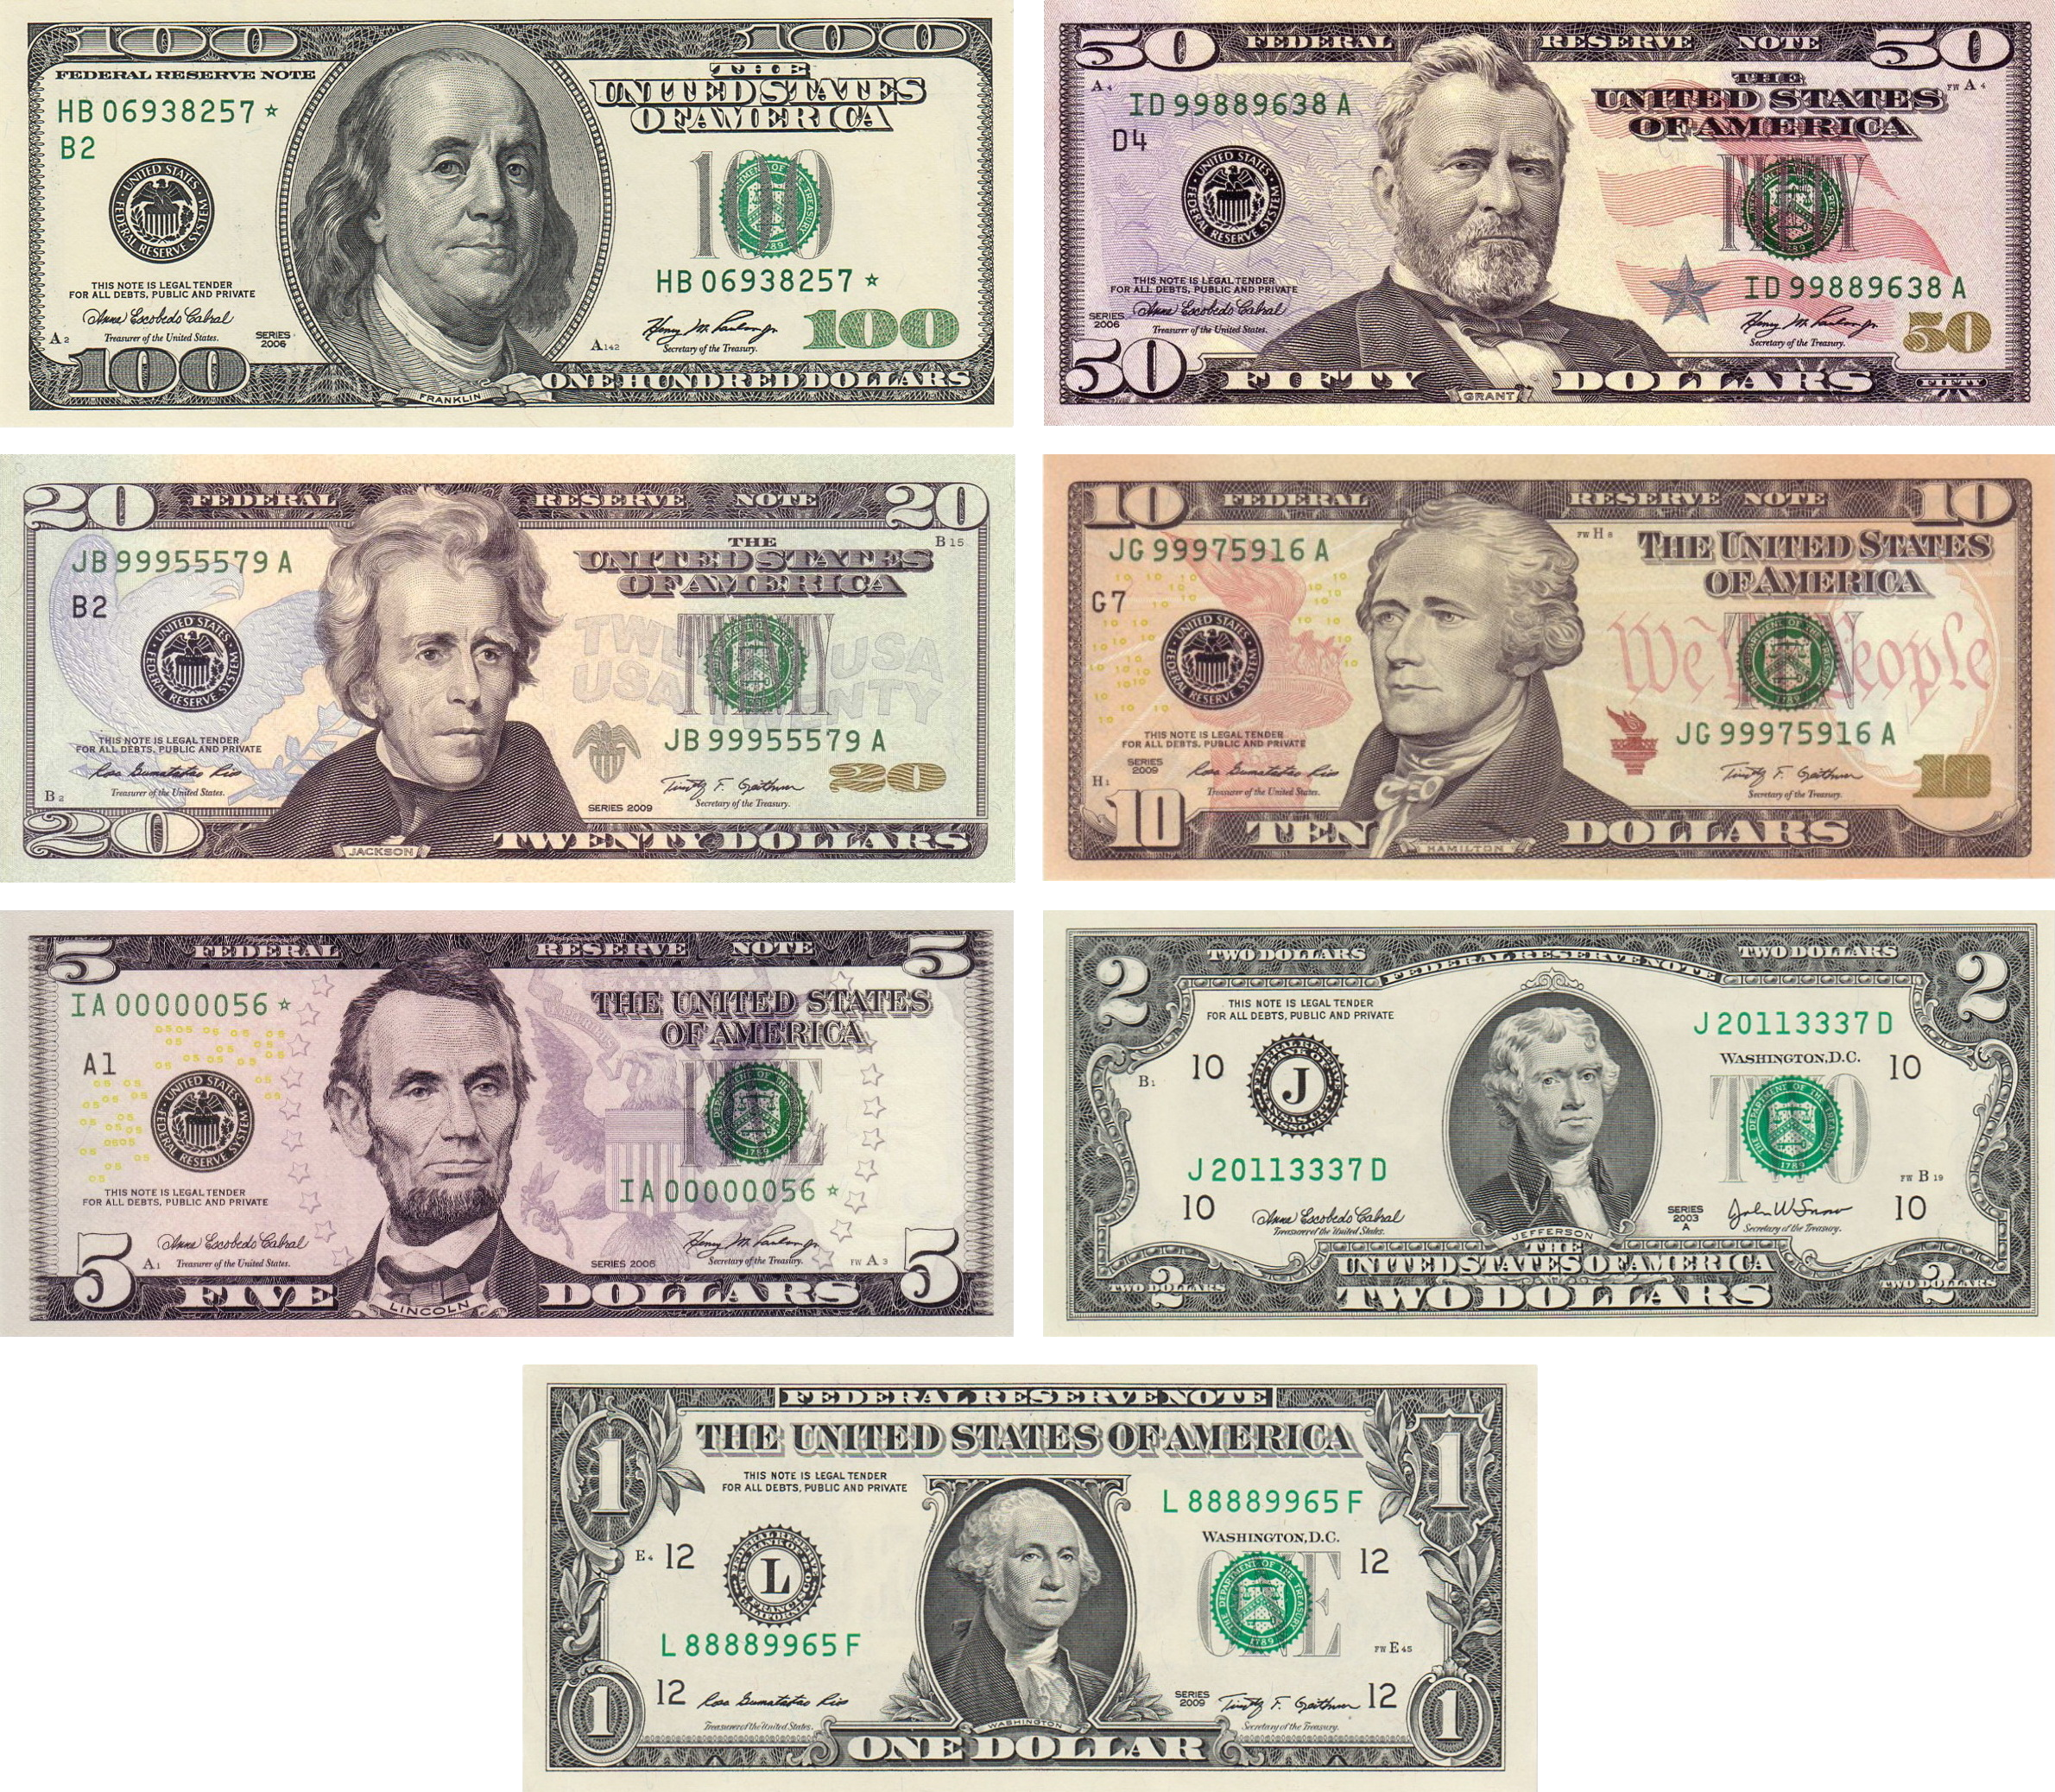 ٢٠٠ الف دولار كم ريال سعودي